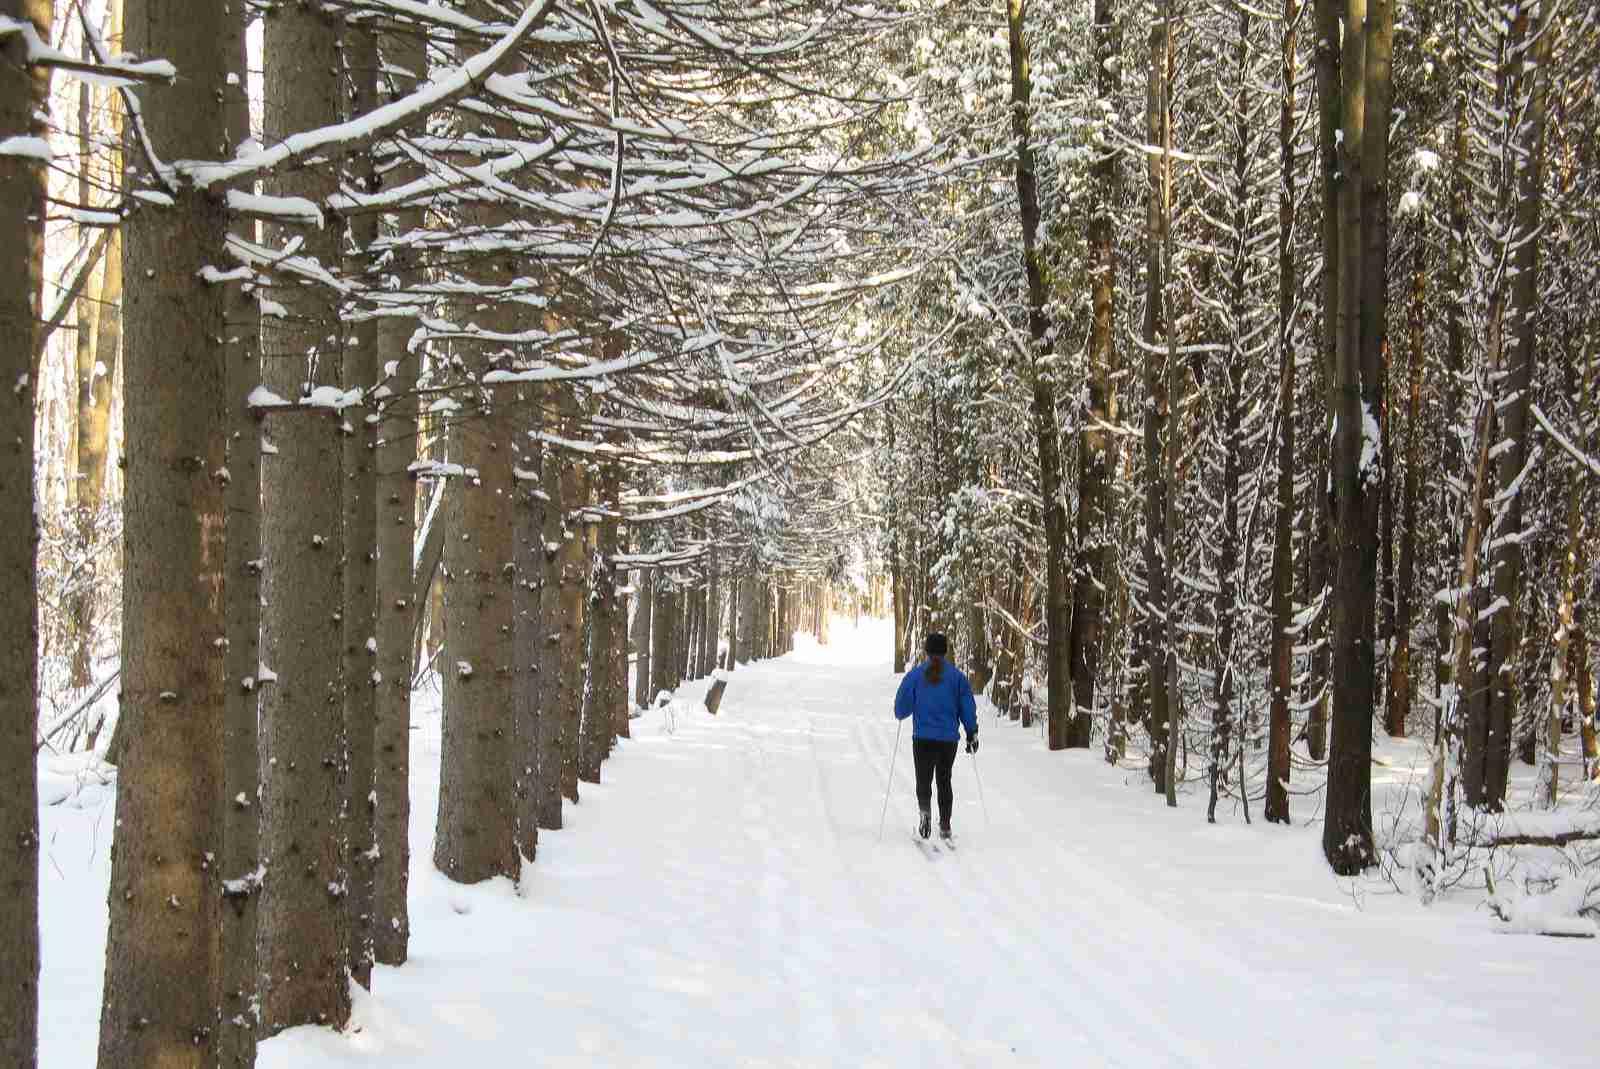 Snowshoeing Montreal 2017 season details for Morgan Arboretum.